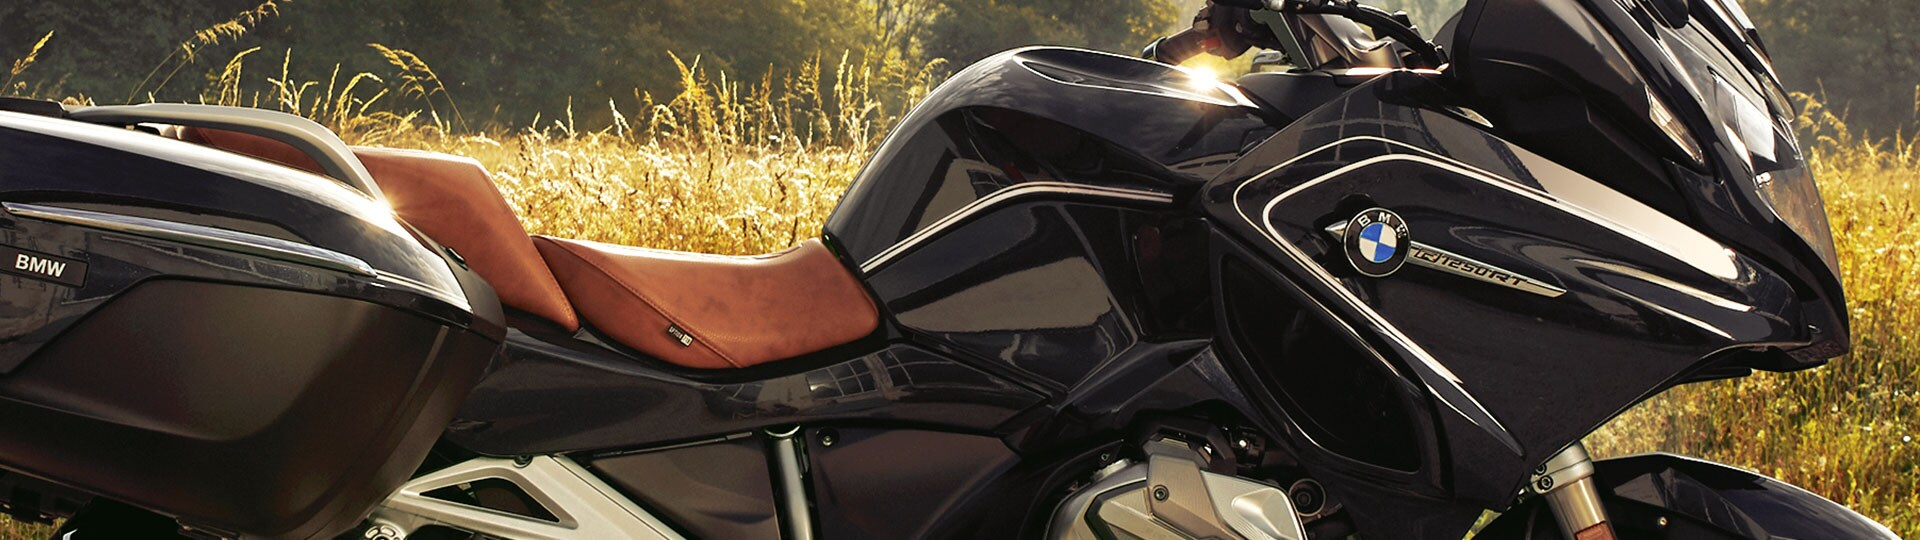 accessoires et quipements bmw motorrad. Black Bedroom Furniture Sets. Home Design Ideas